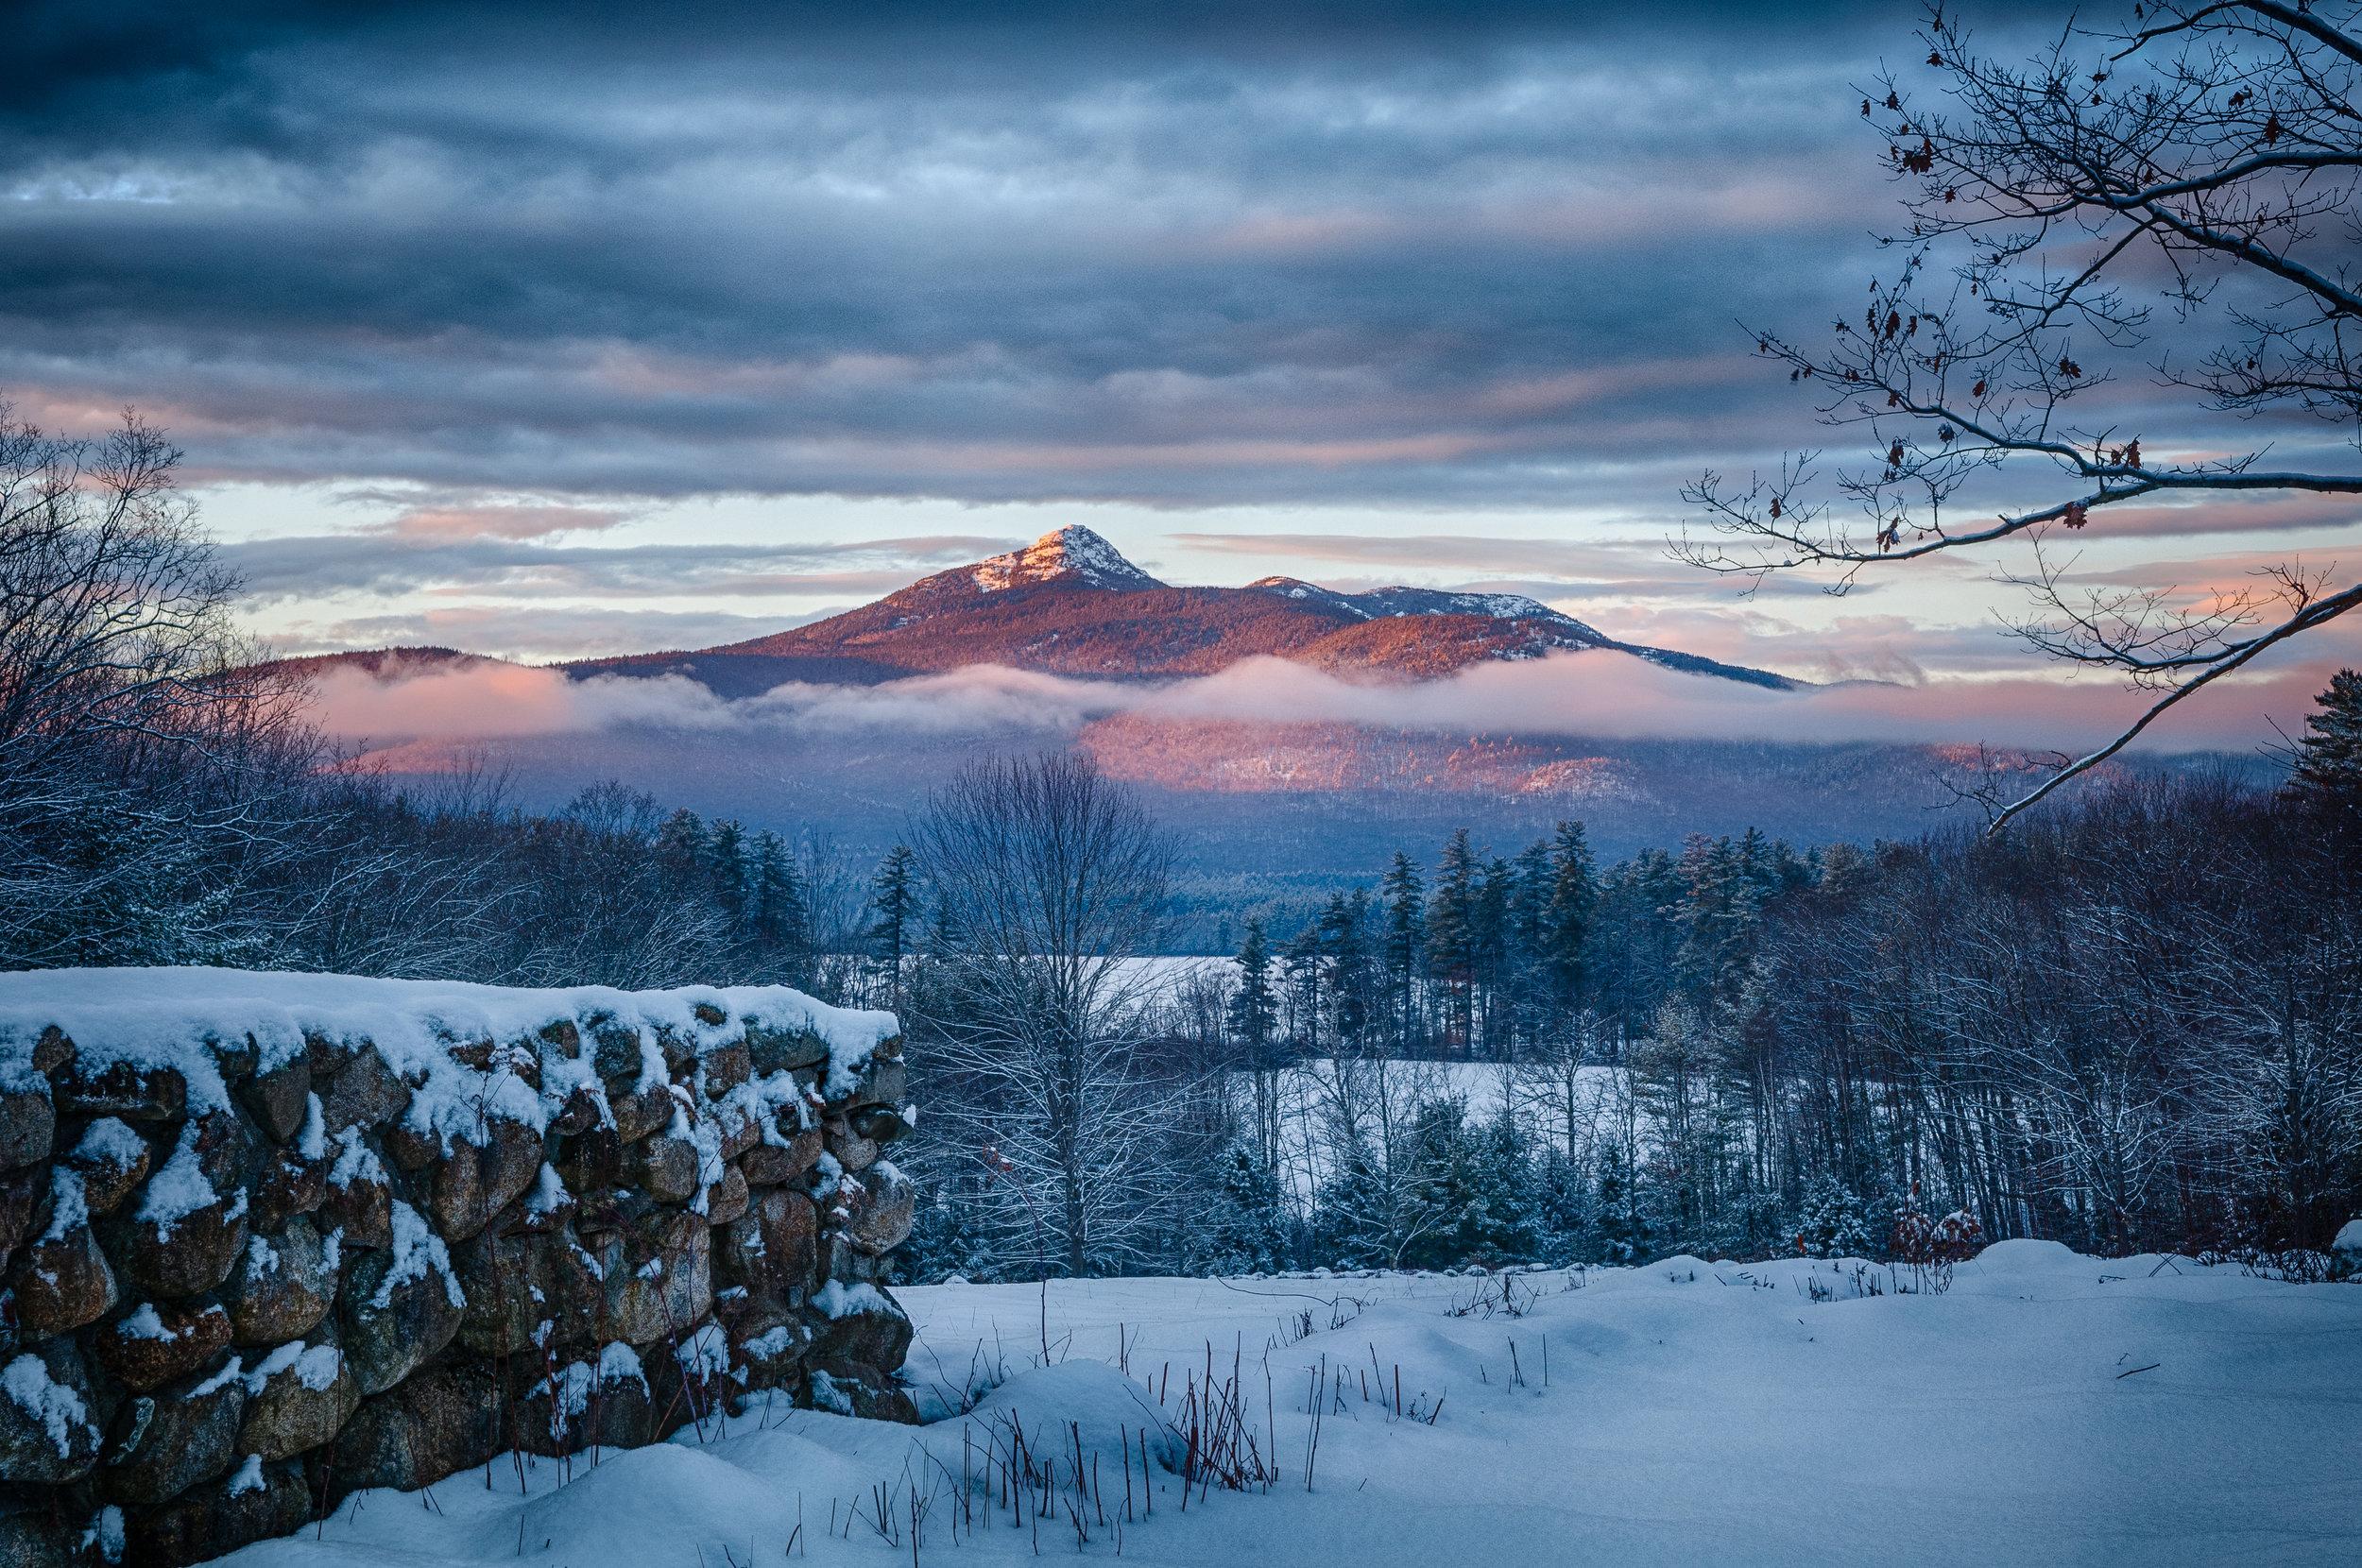 Basin View Lot, winter